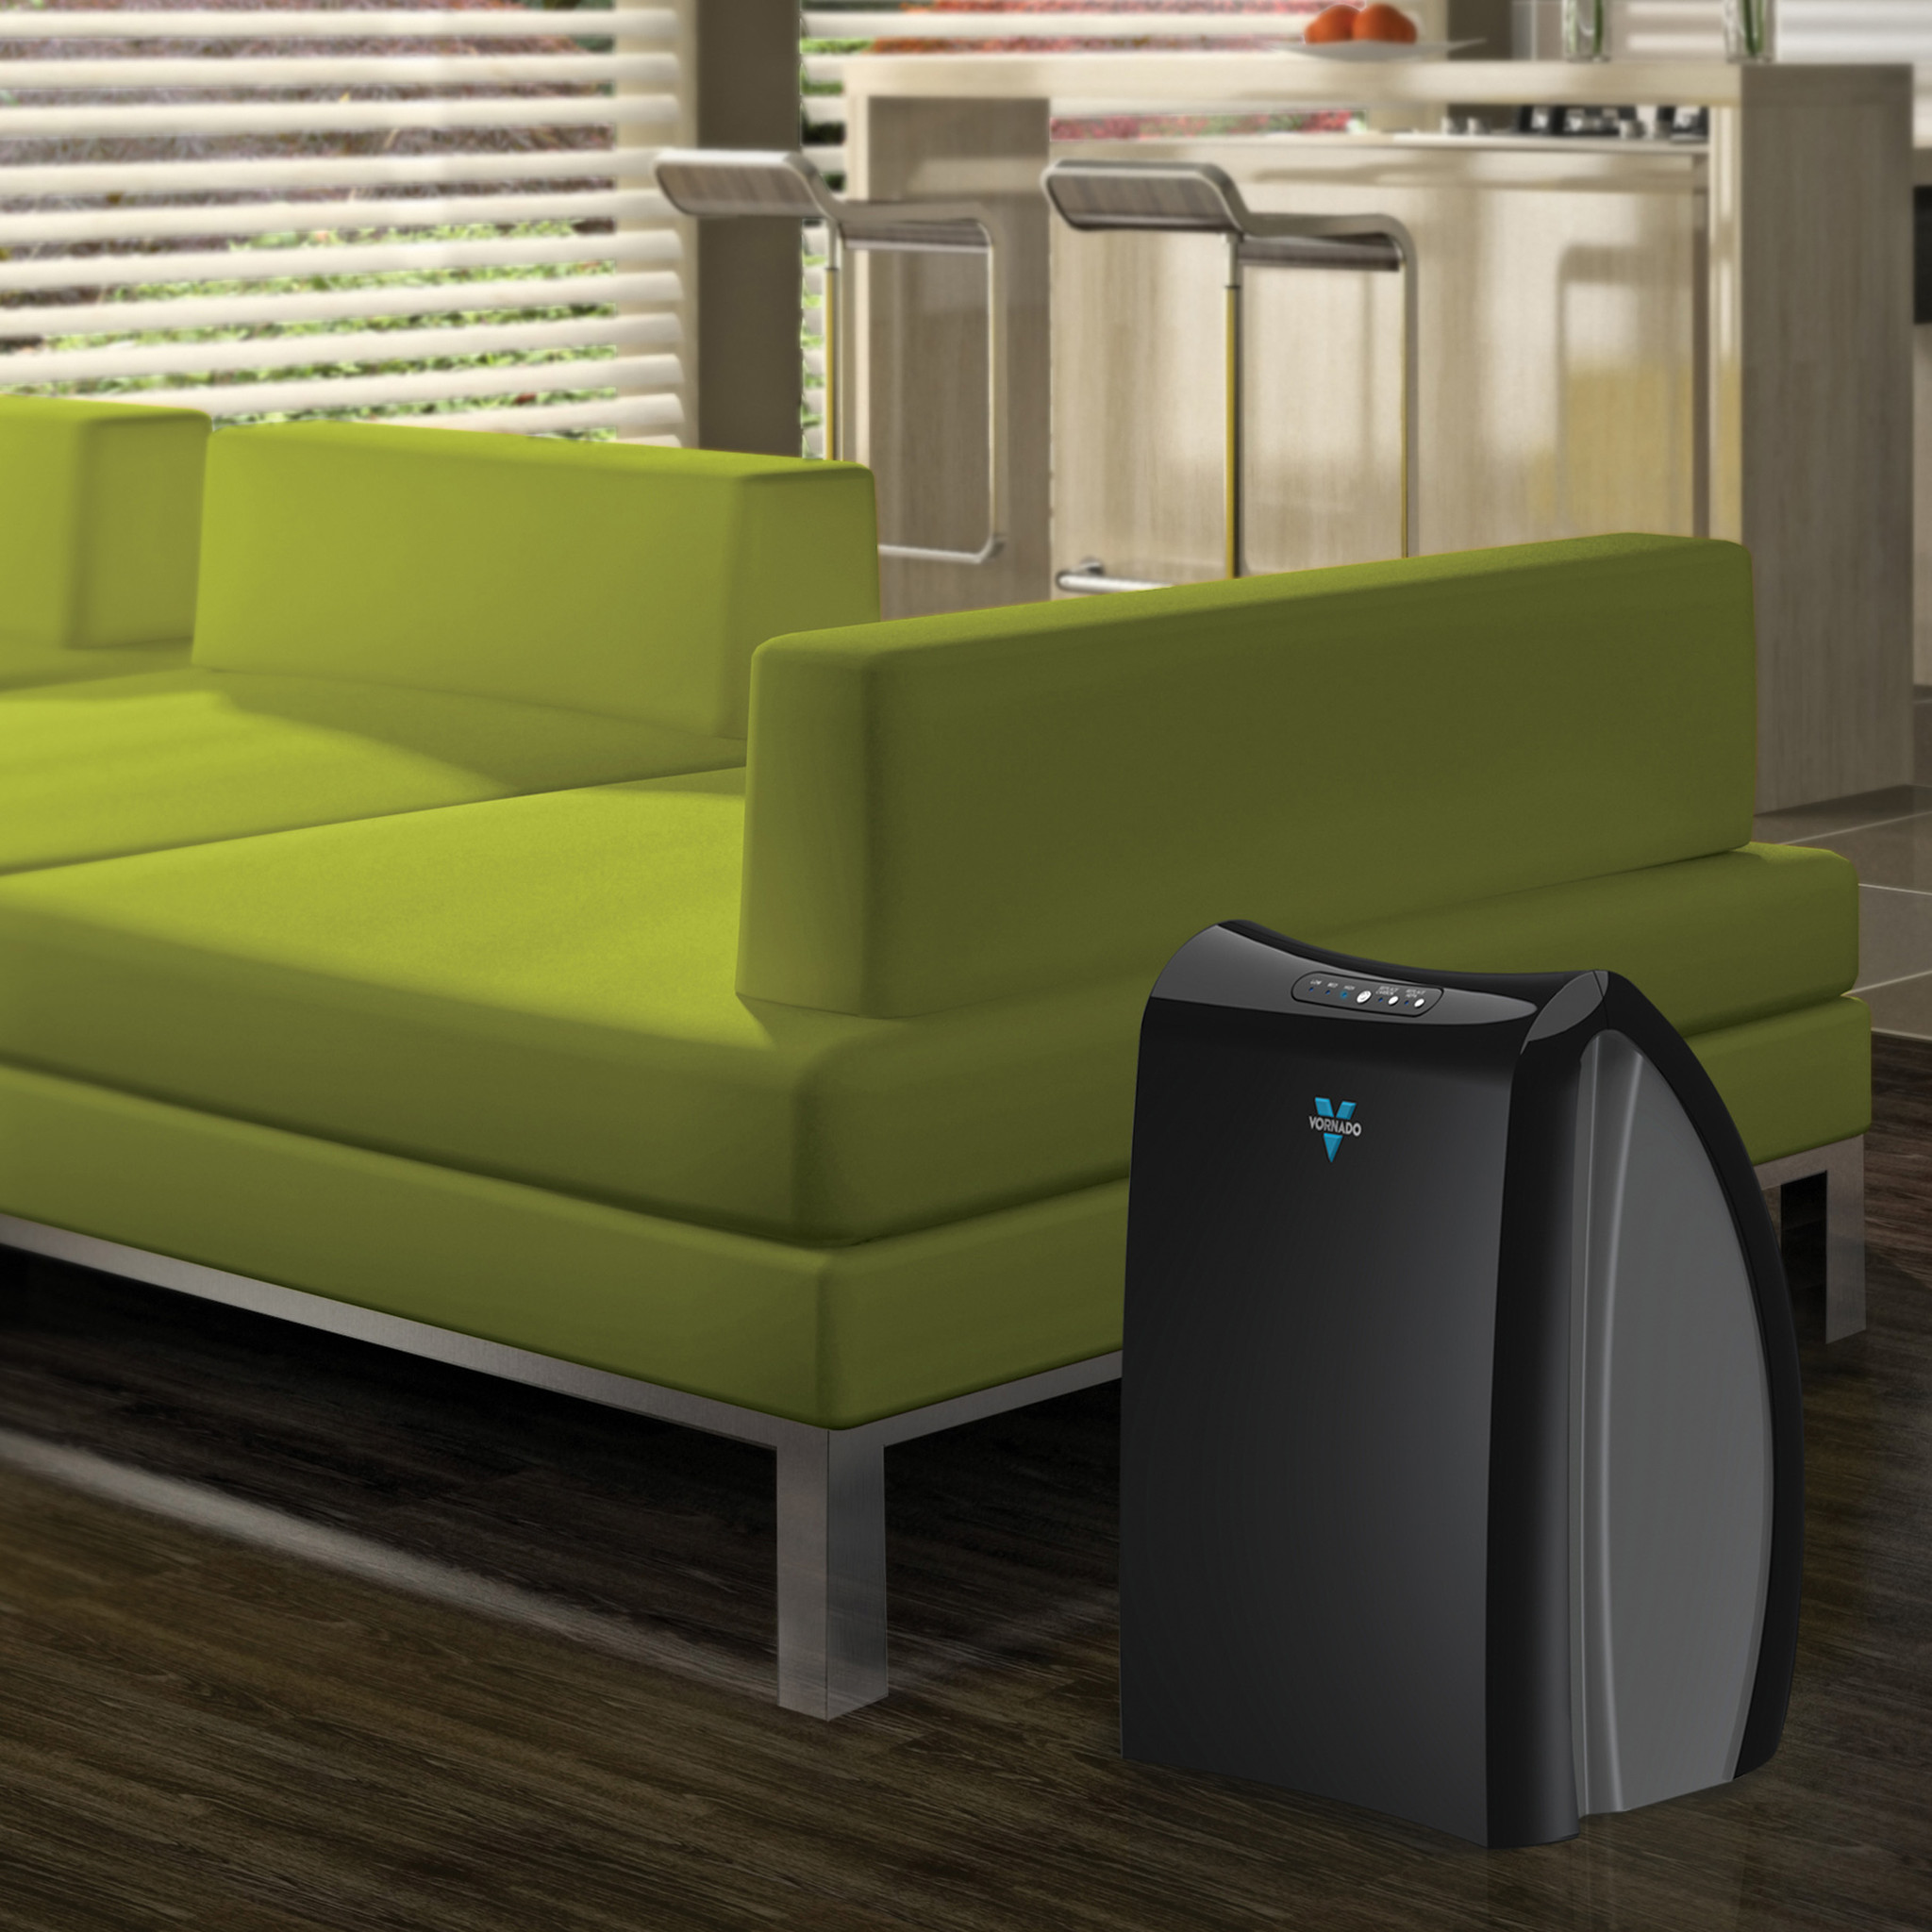 Three Best Air Purifiers for Smoke  HomesFeed